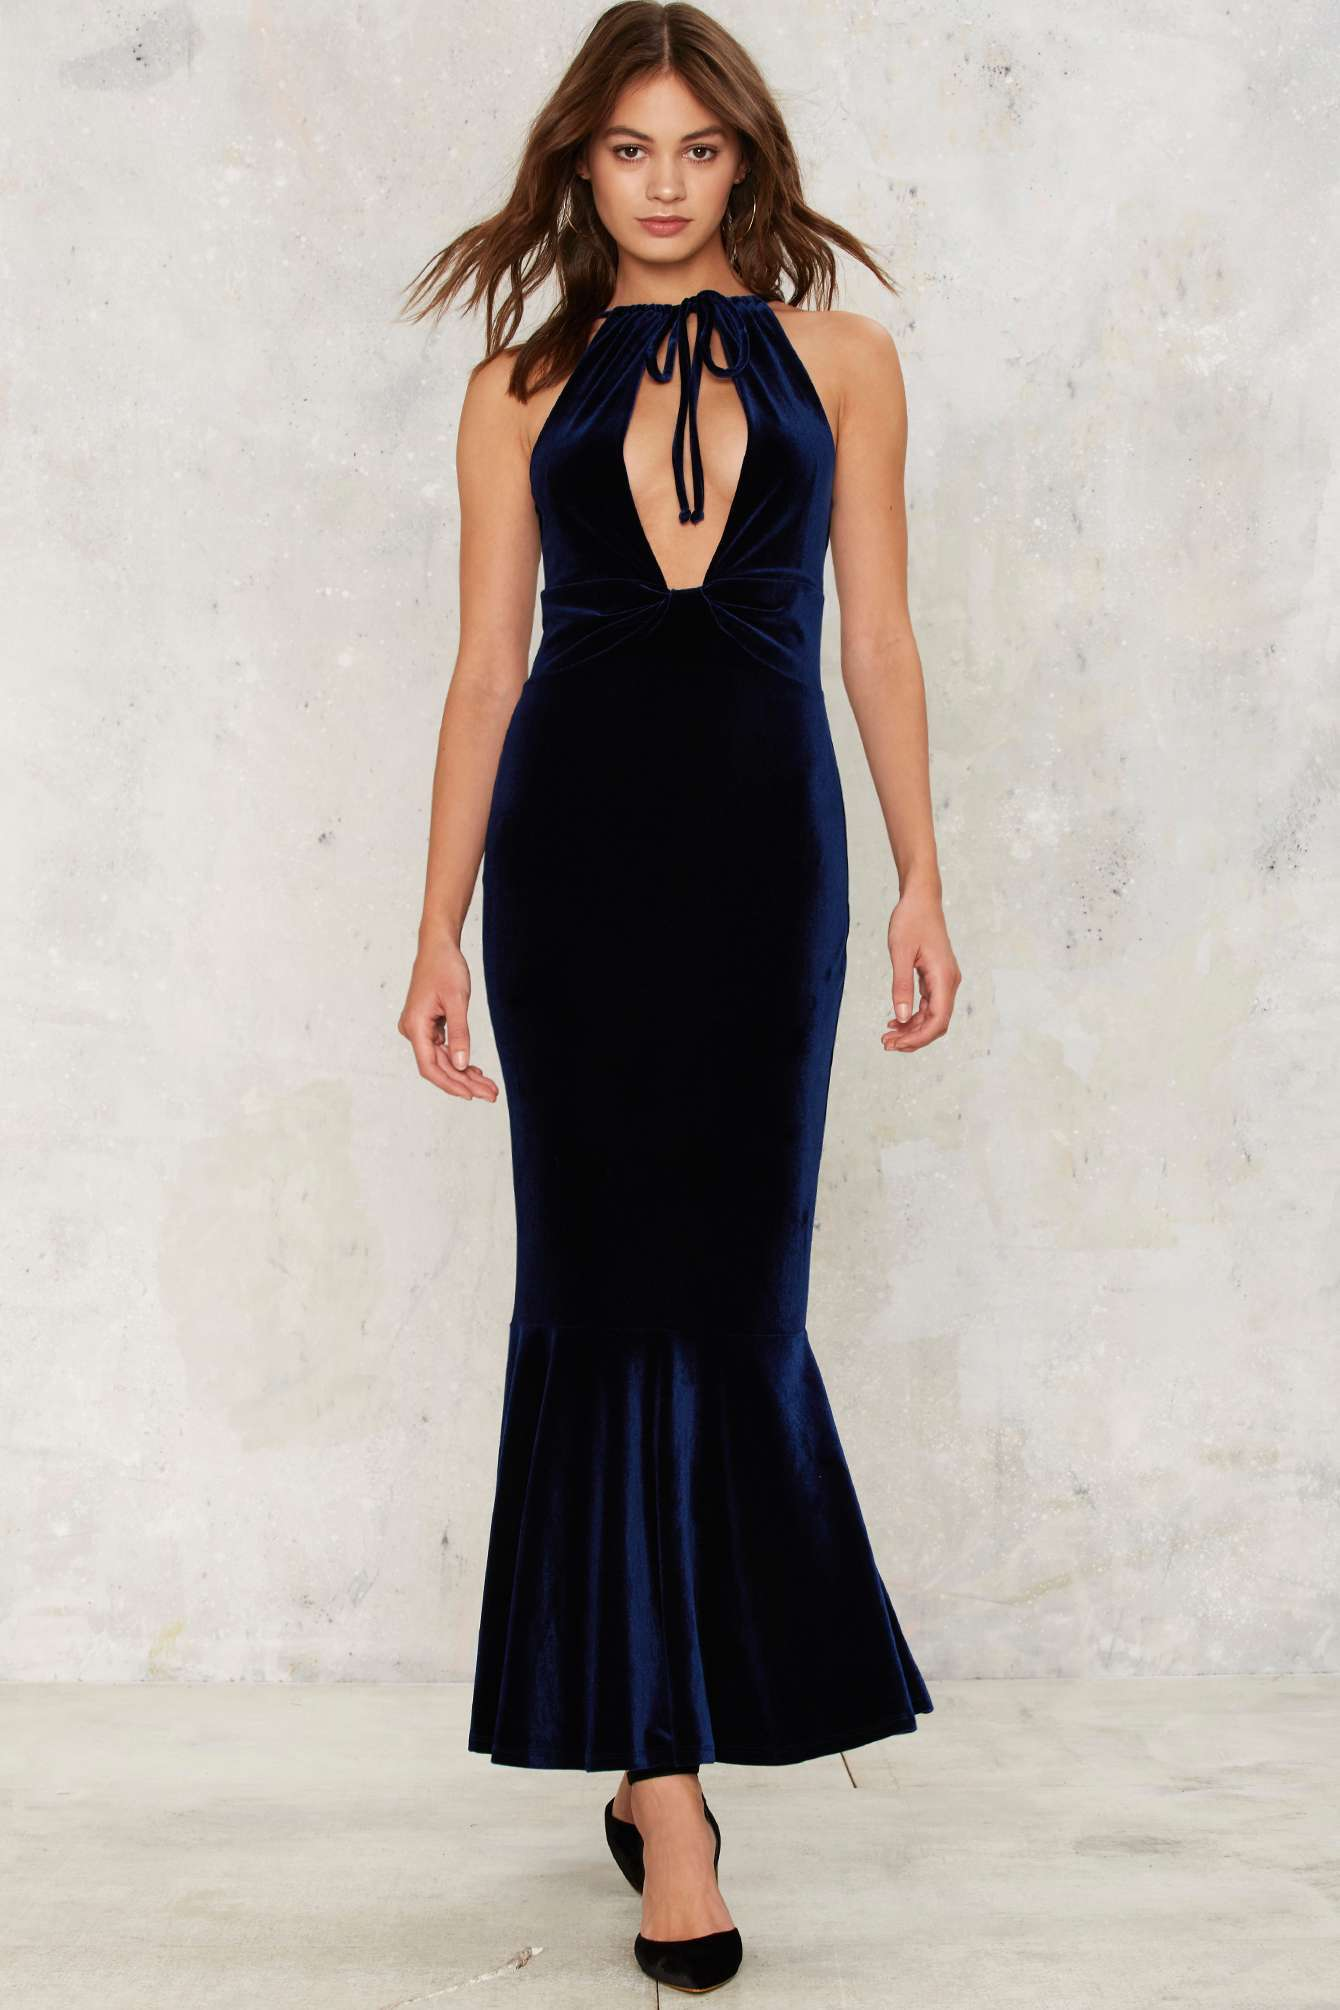 Nasty Gal Bid Adieu Velvet Maxi Dress